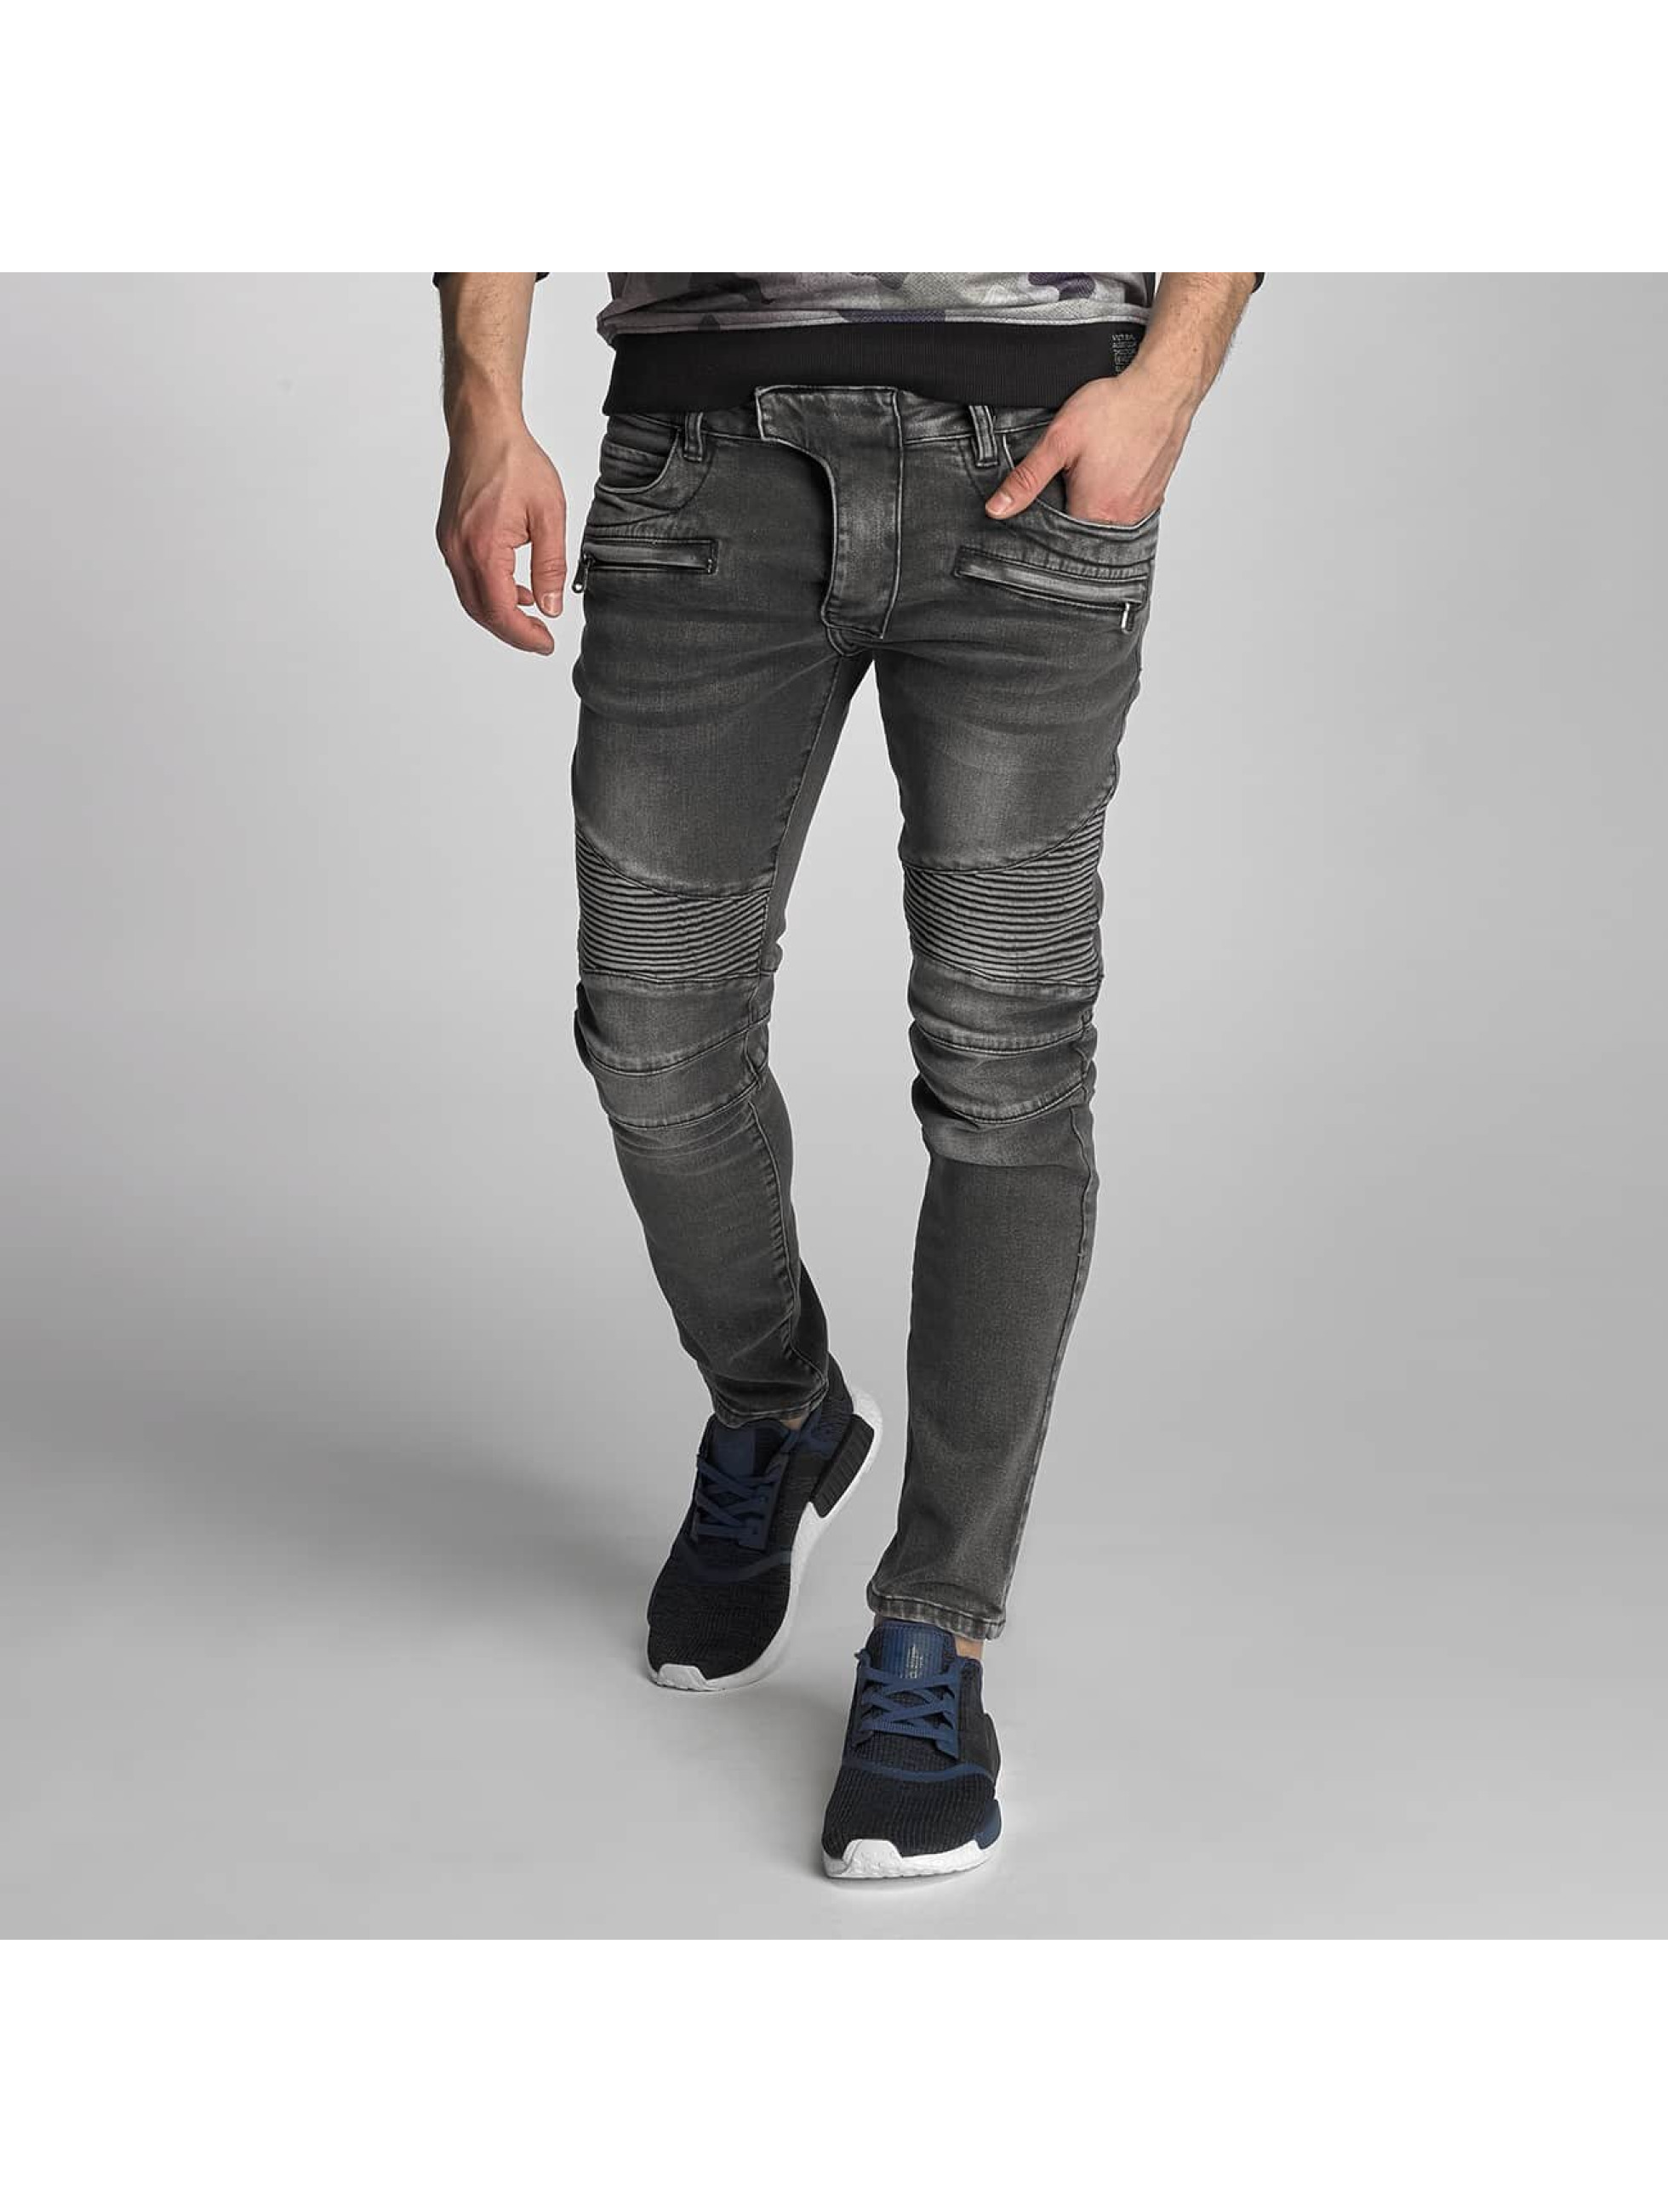 vsct clubwear herren jeans antifit liam biker ebay. Black Bedroom Furniture Sets. Home Design Ideas